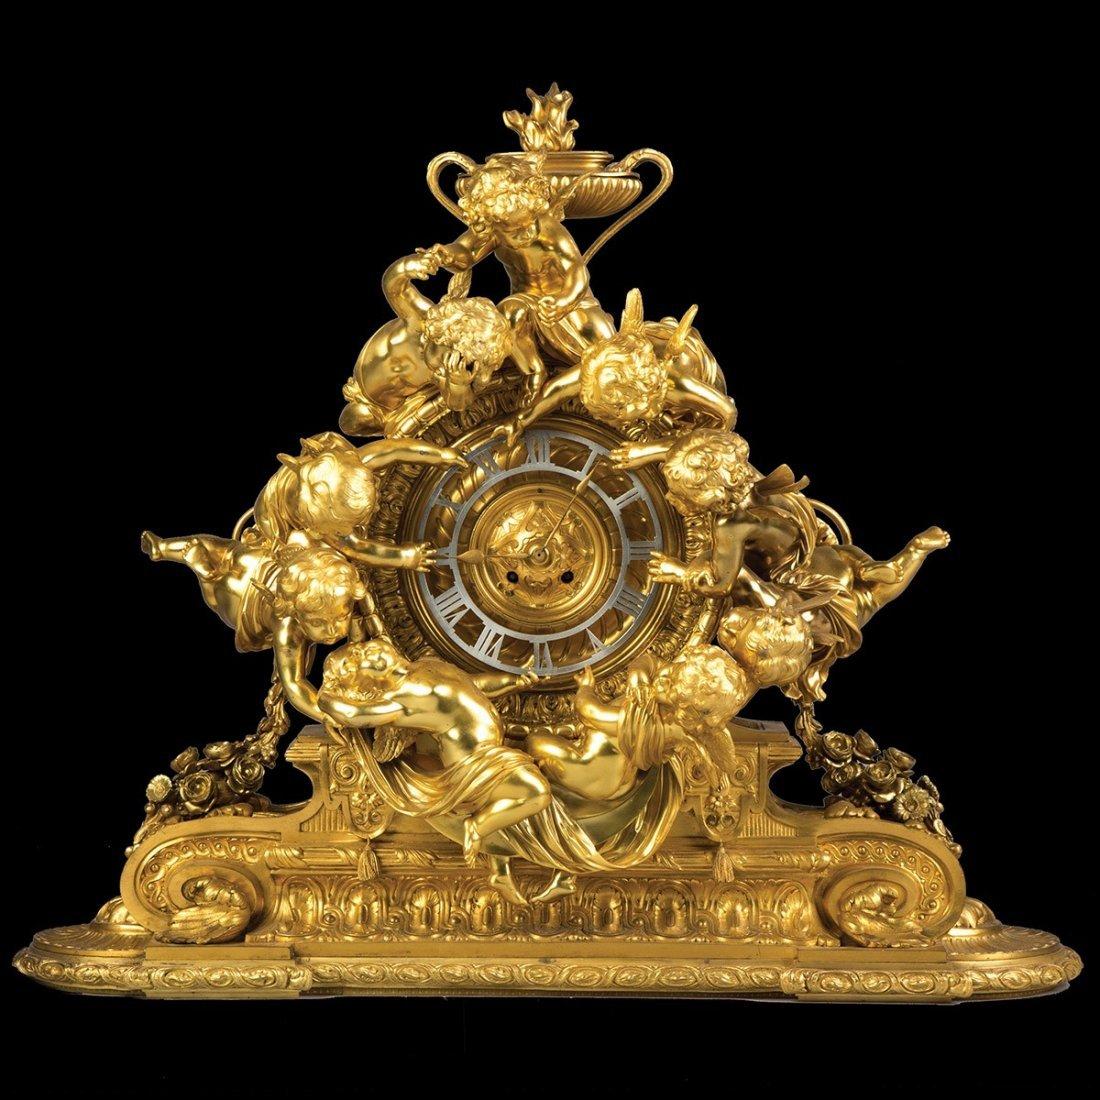 Monumental French Napoleon III Gilt Bronze Mantel Clock